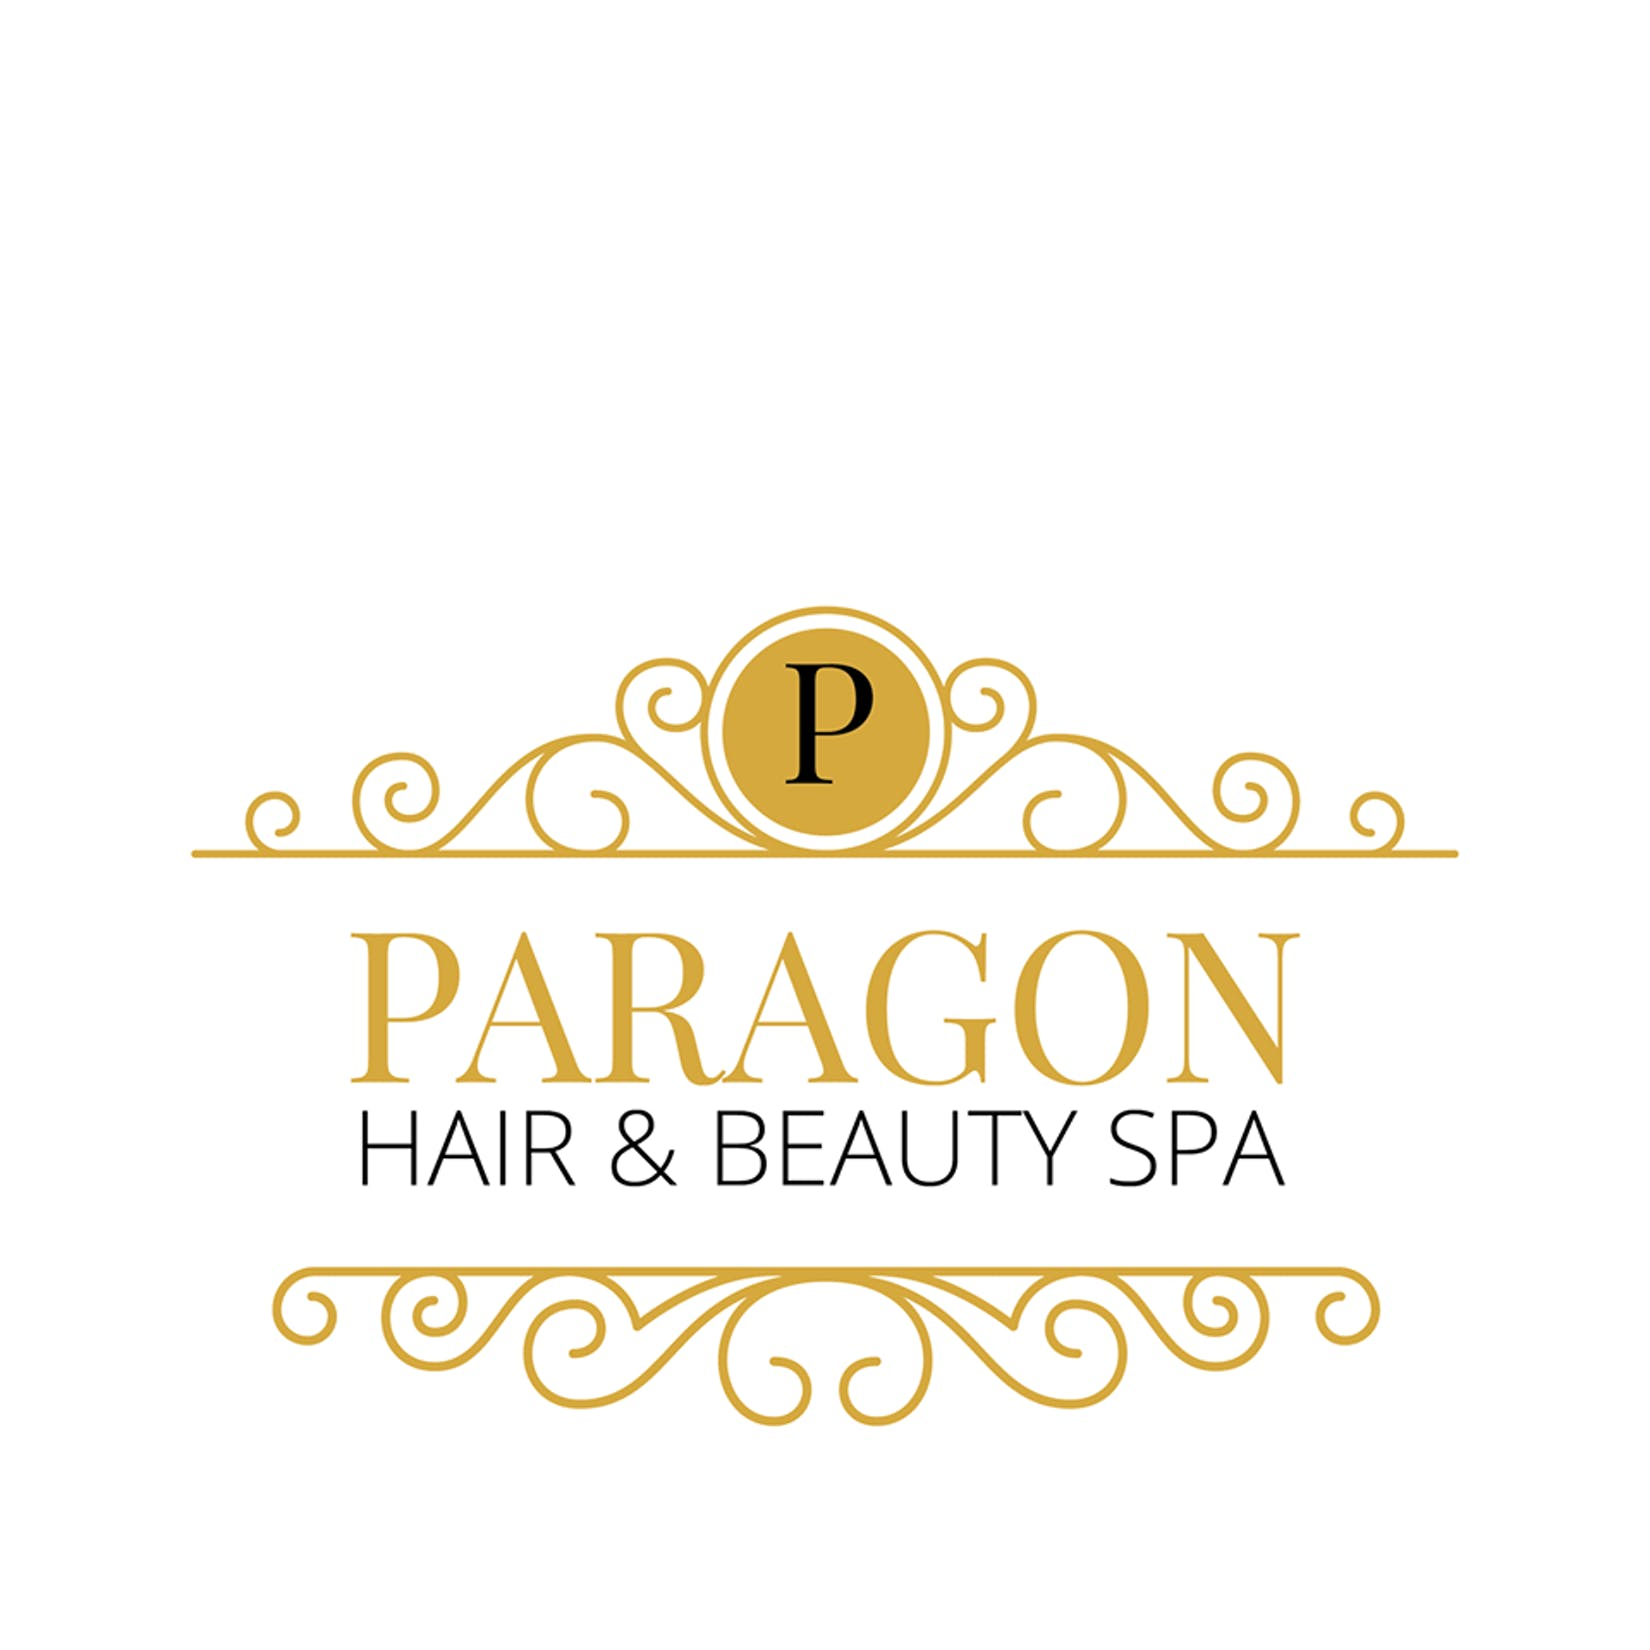 Paragon - Hair & Beauty Spa | Beauty